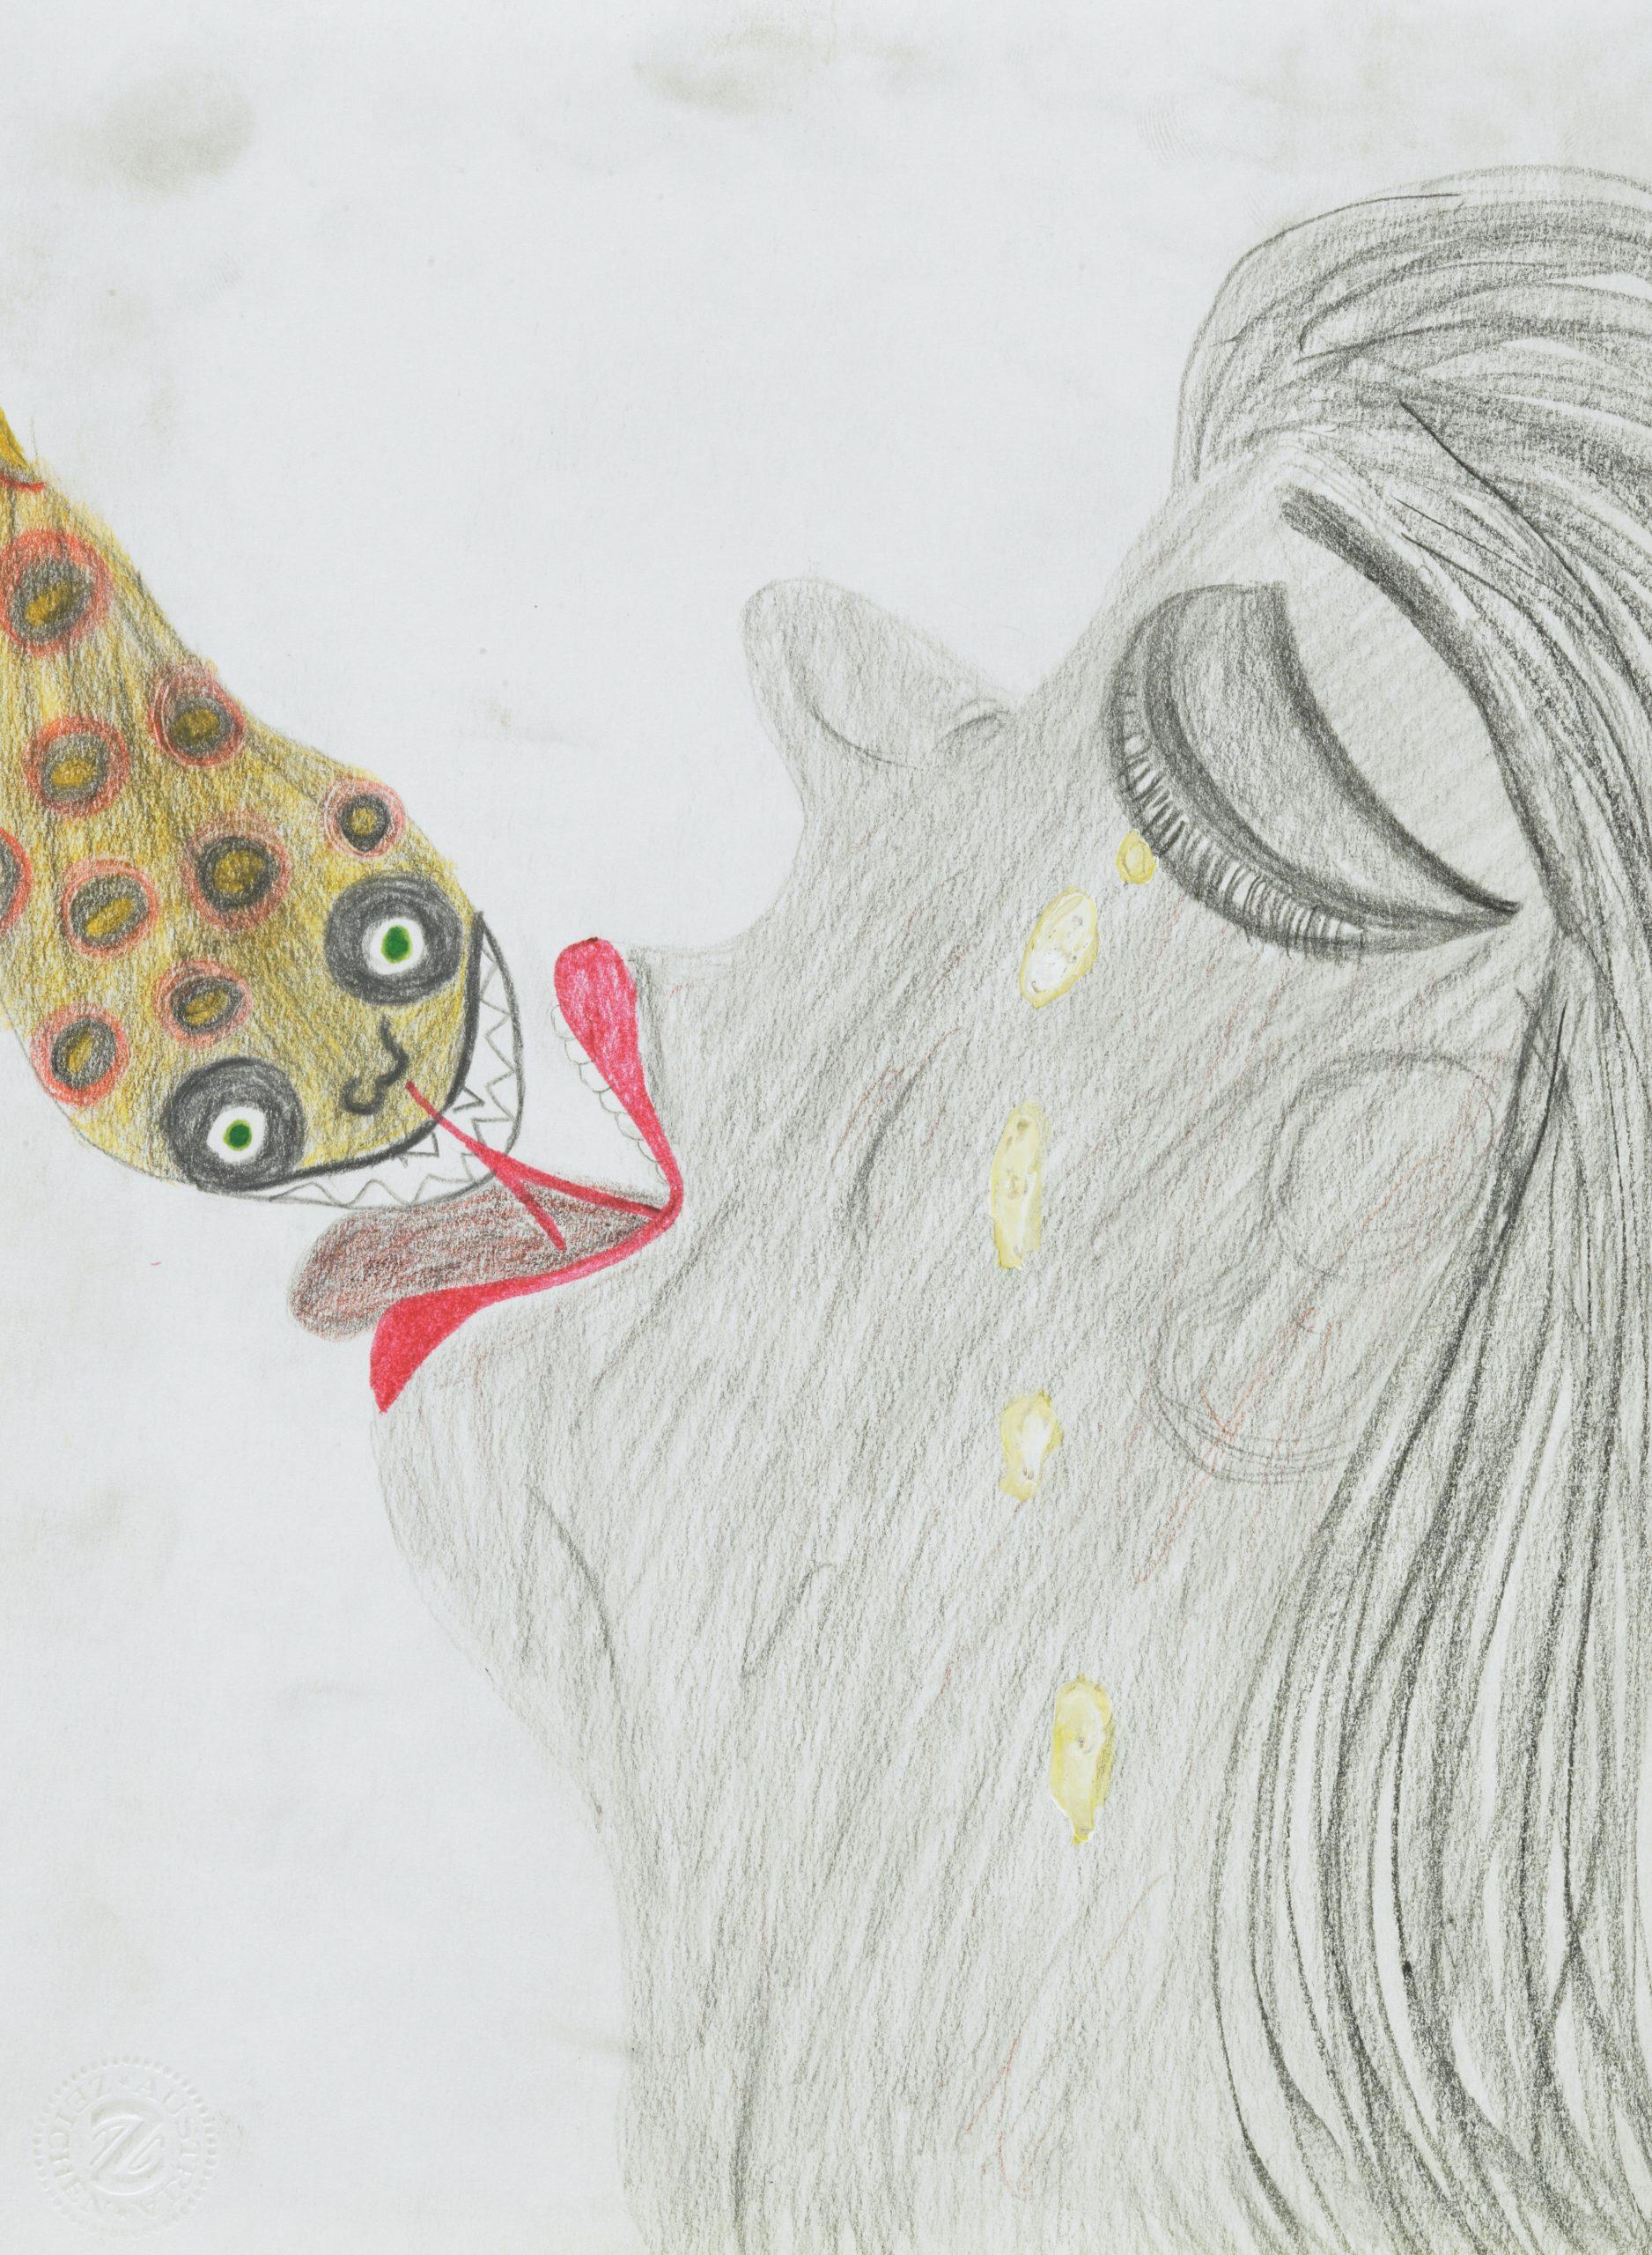 demlczuk barbara - ohne titel / untitled